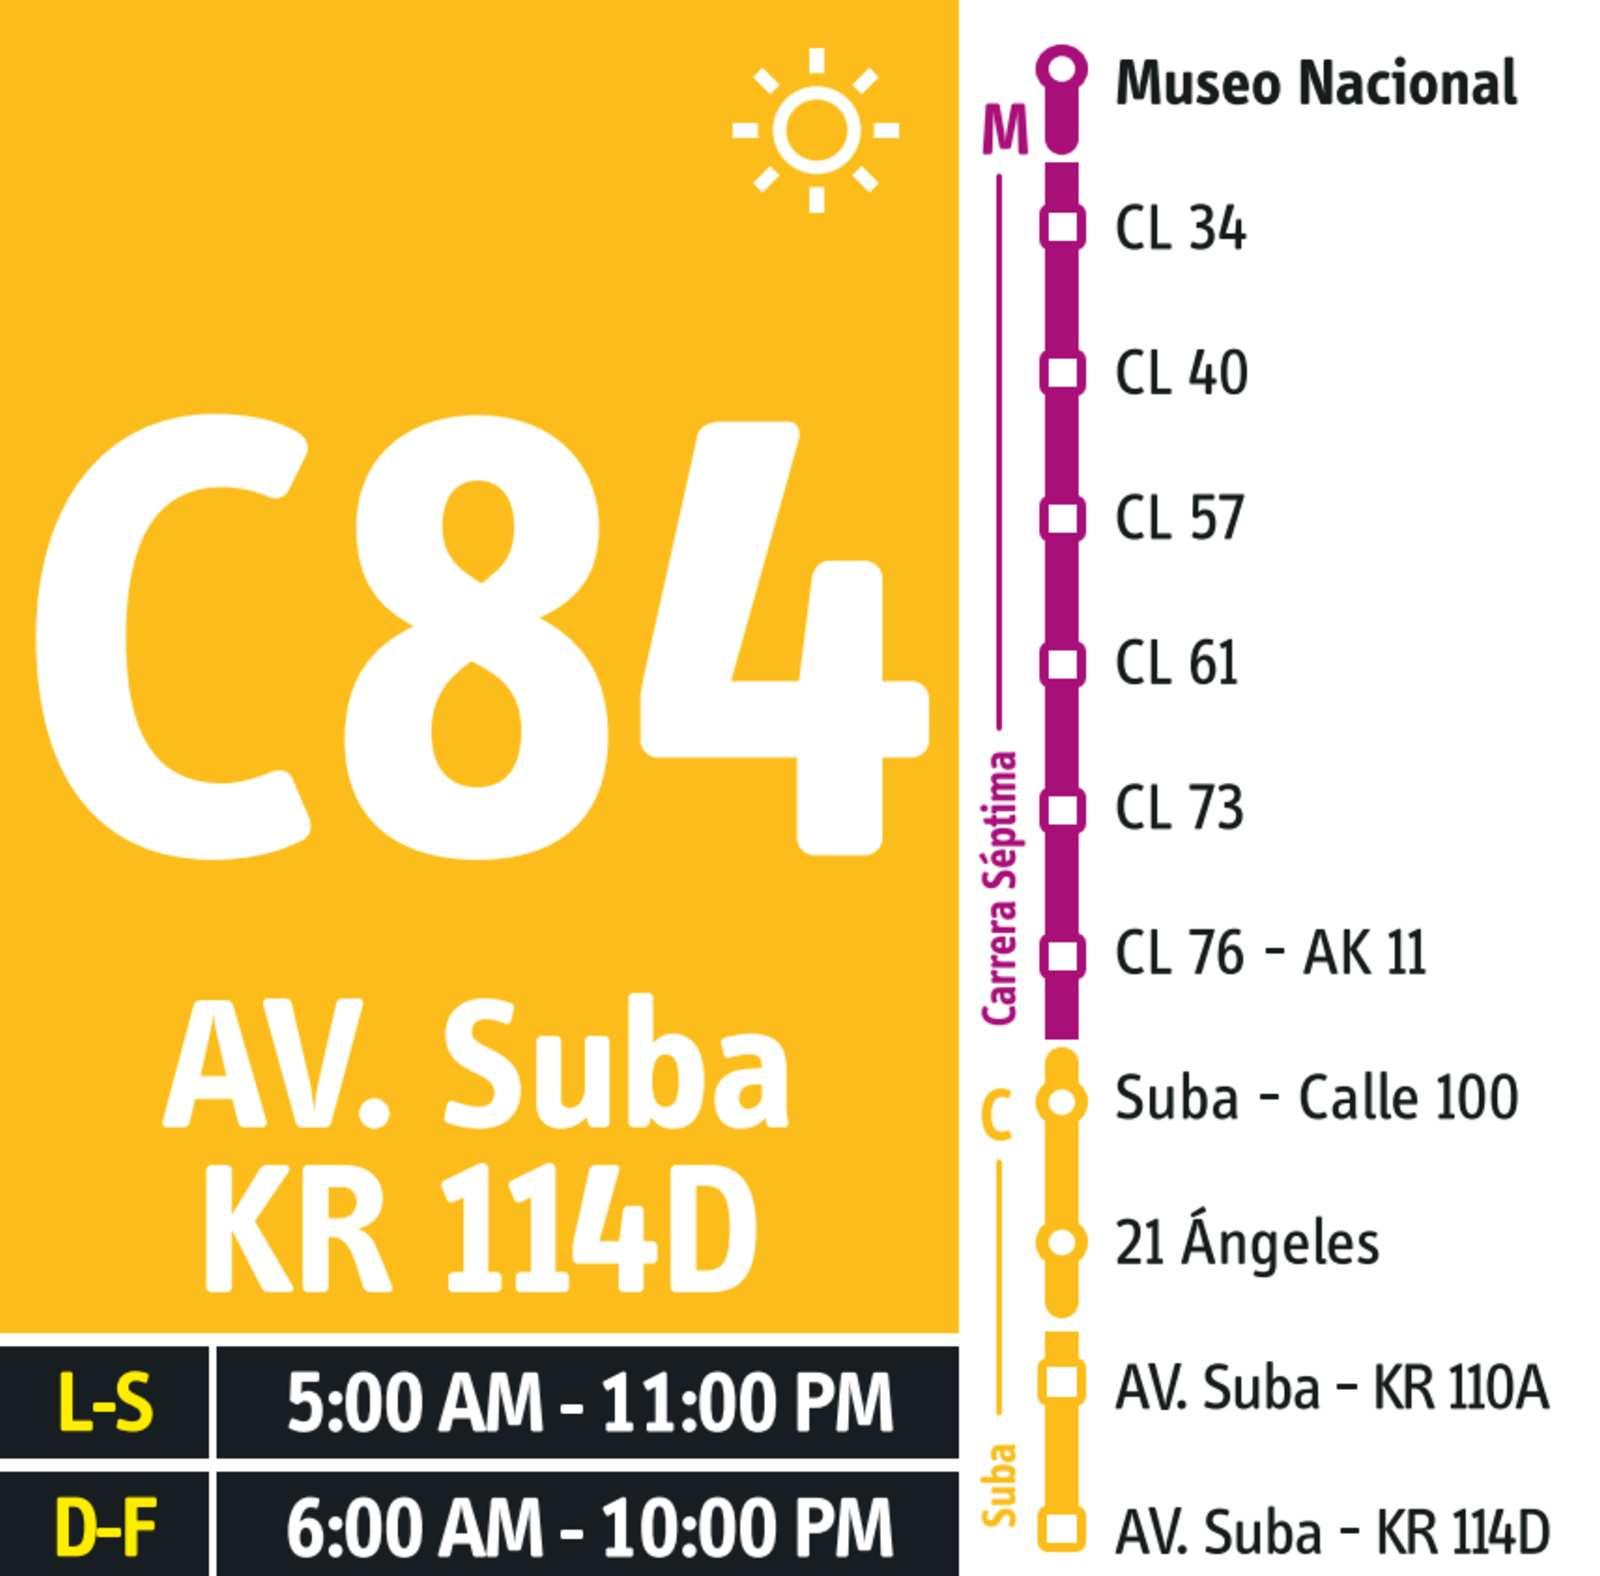 C84-M84 >ETB Tibabuyes - Museo Nacional (dual)